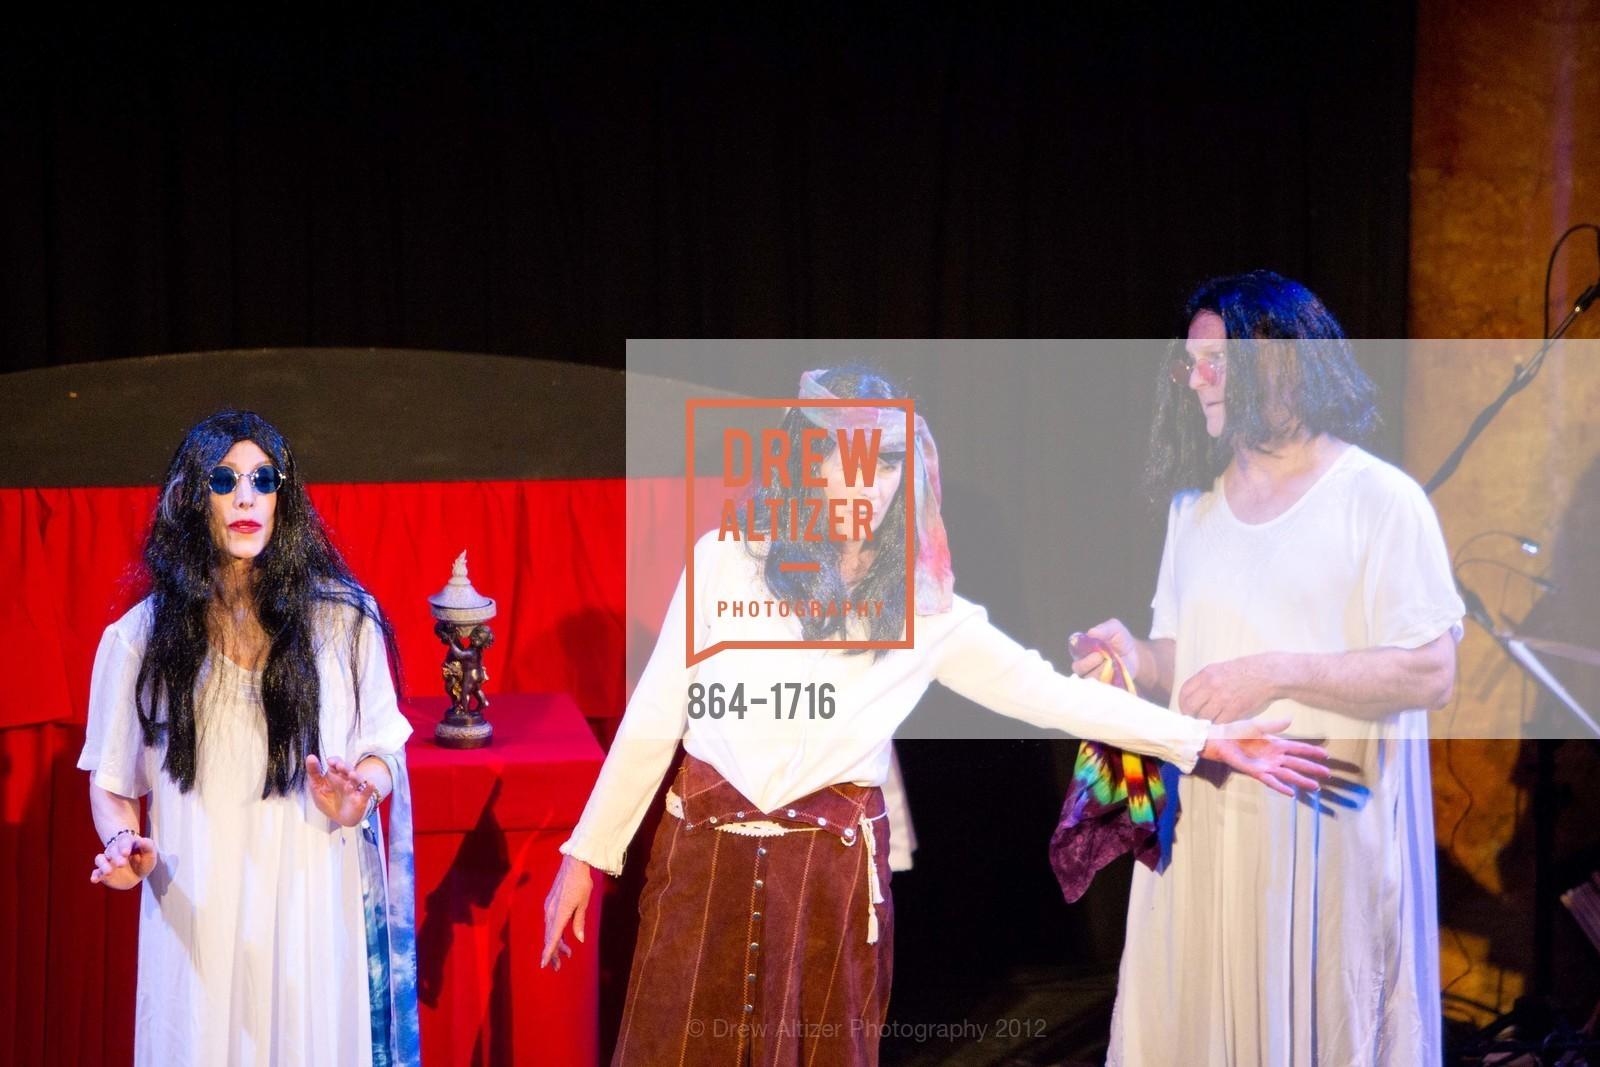 Performance, Photo #864-1716